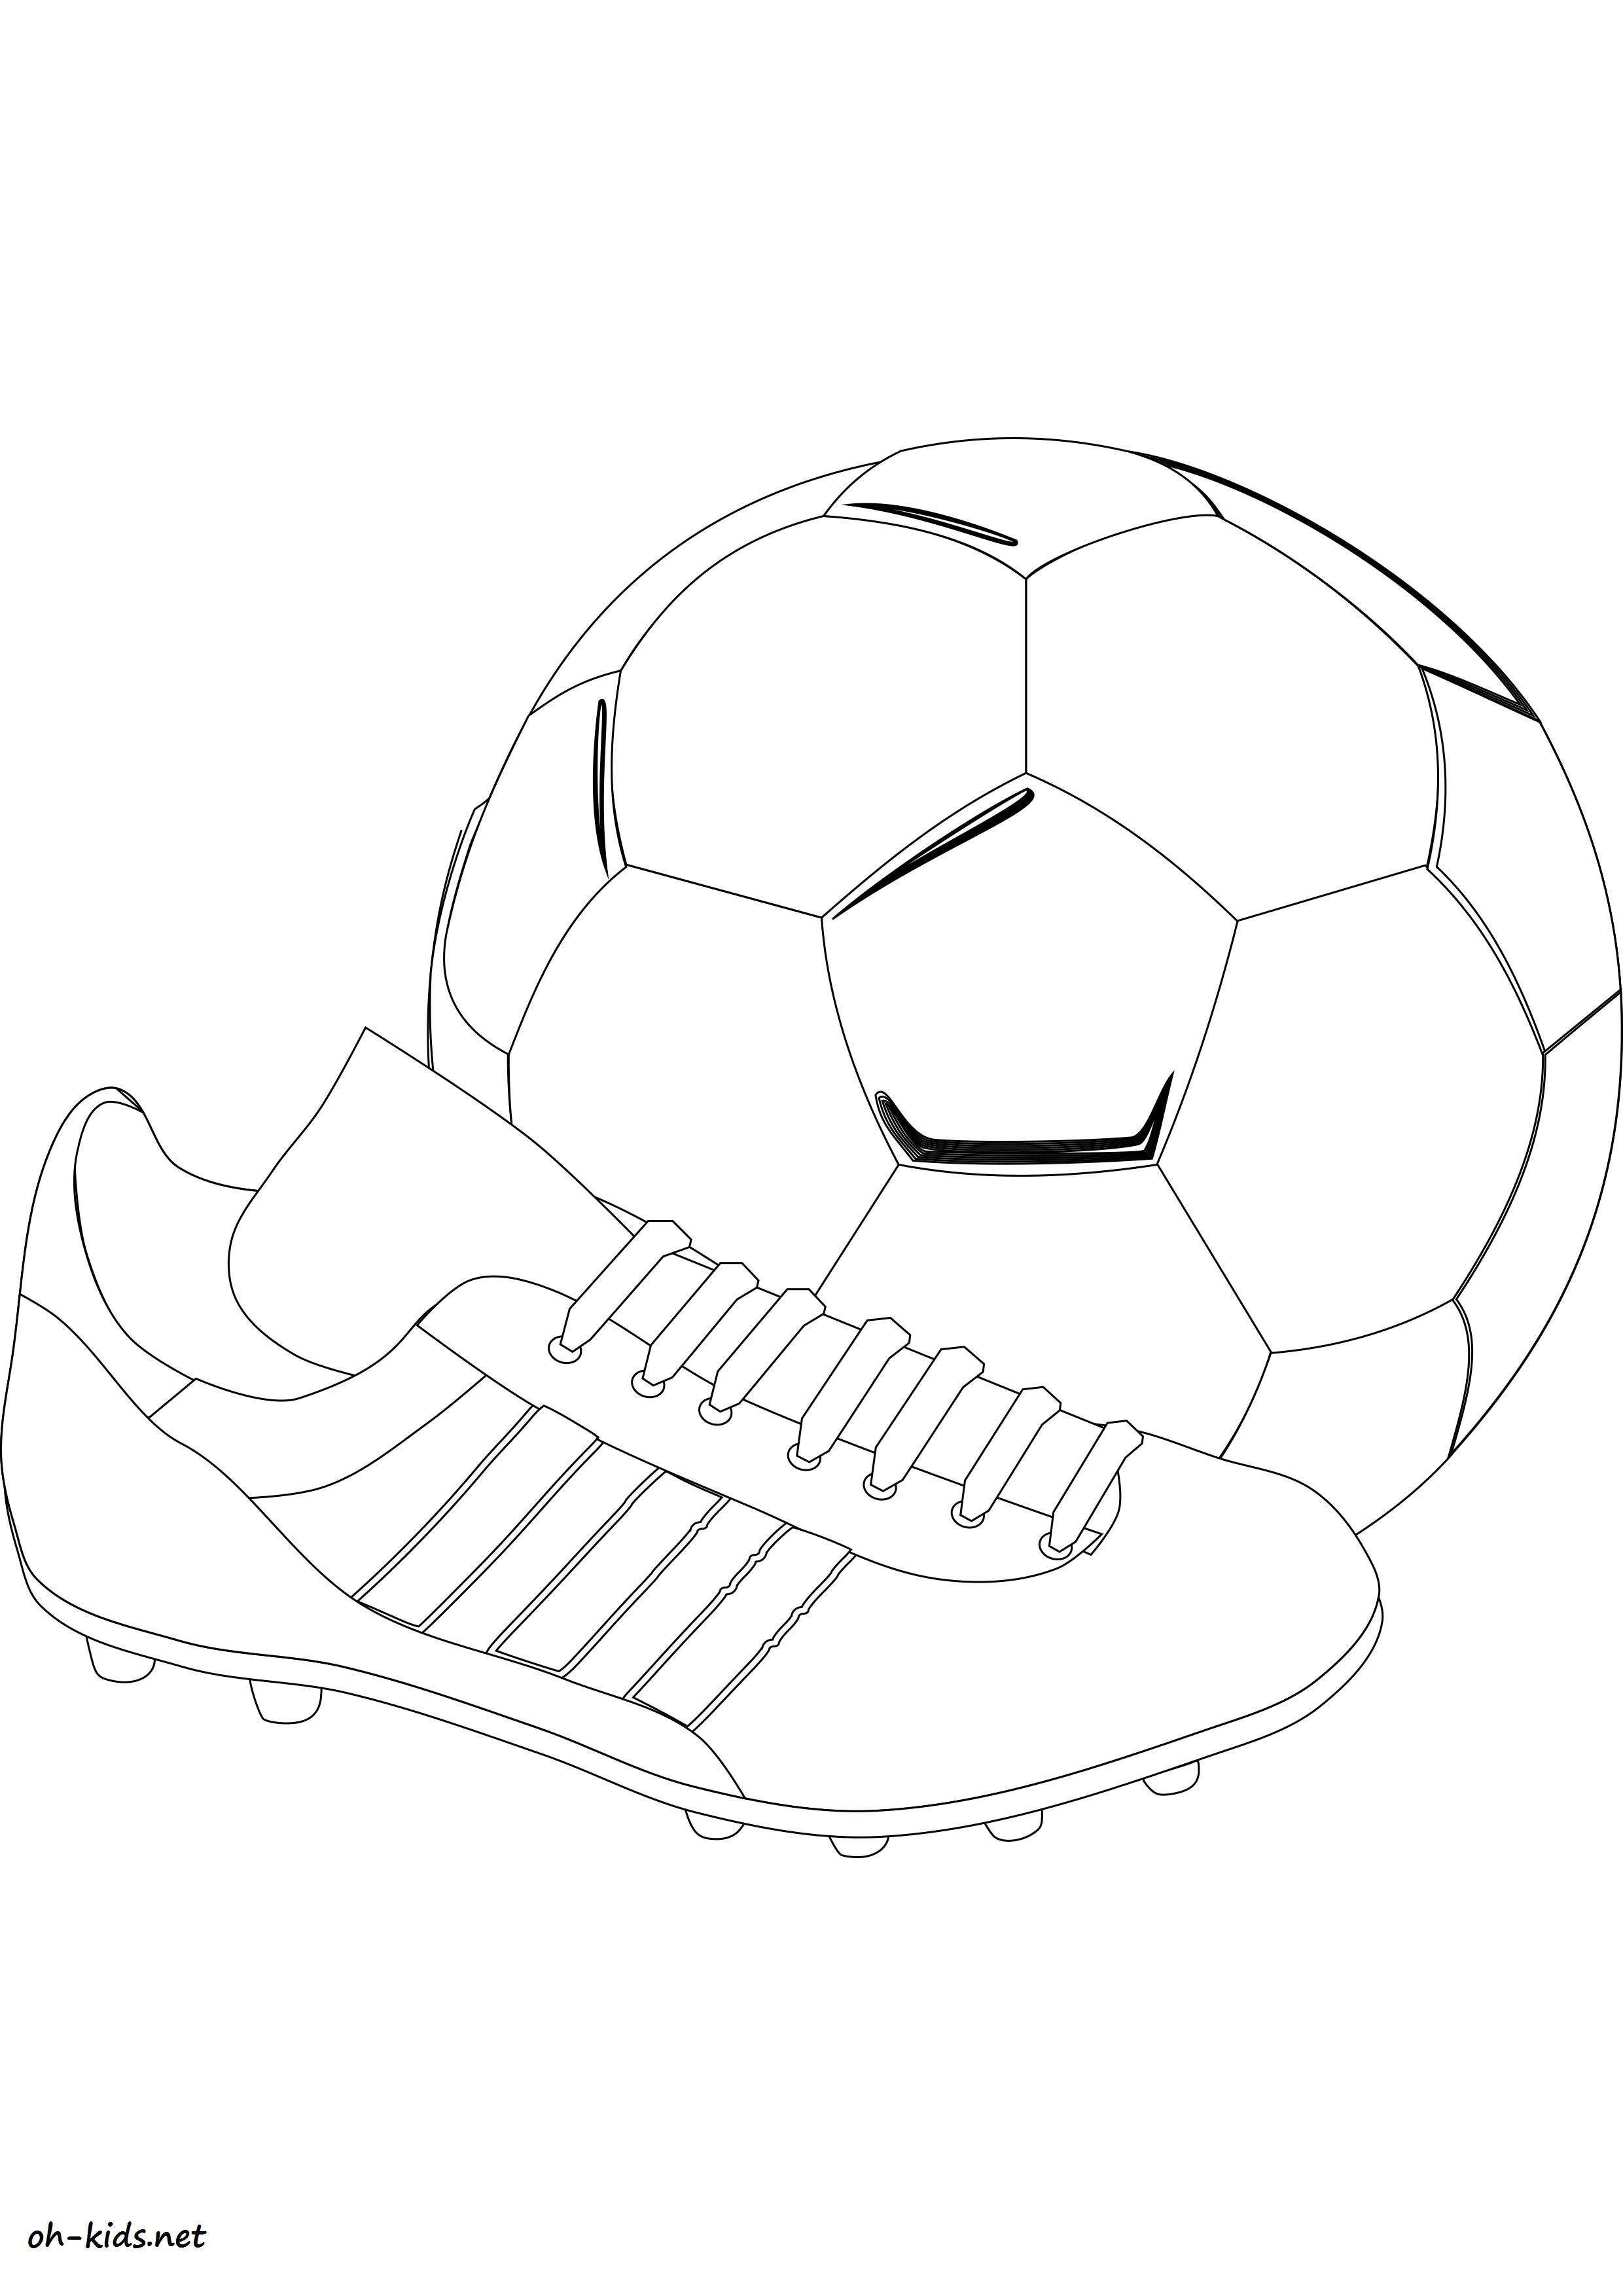 coloriage de foot à imprimer - Dessin #1135